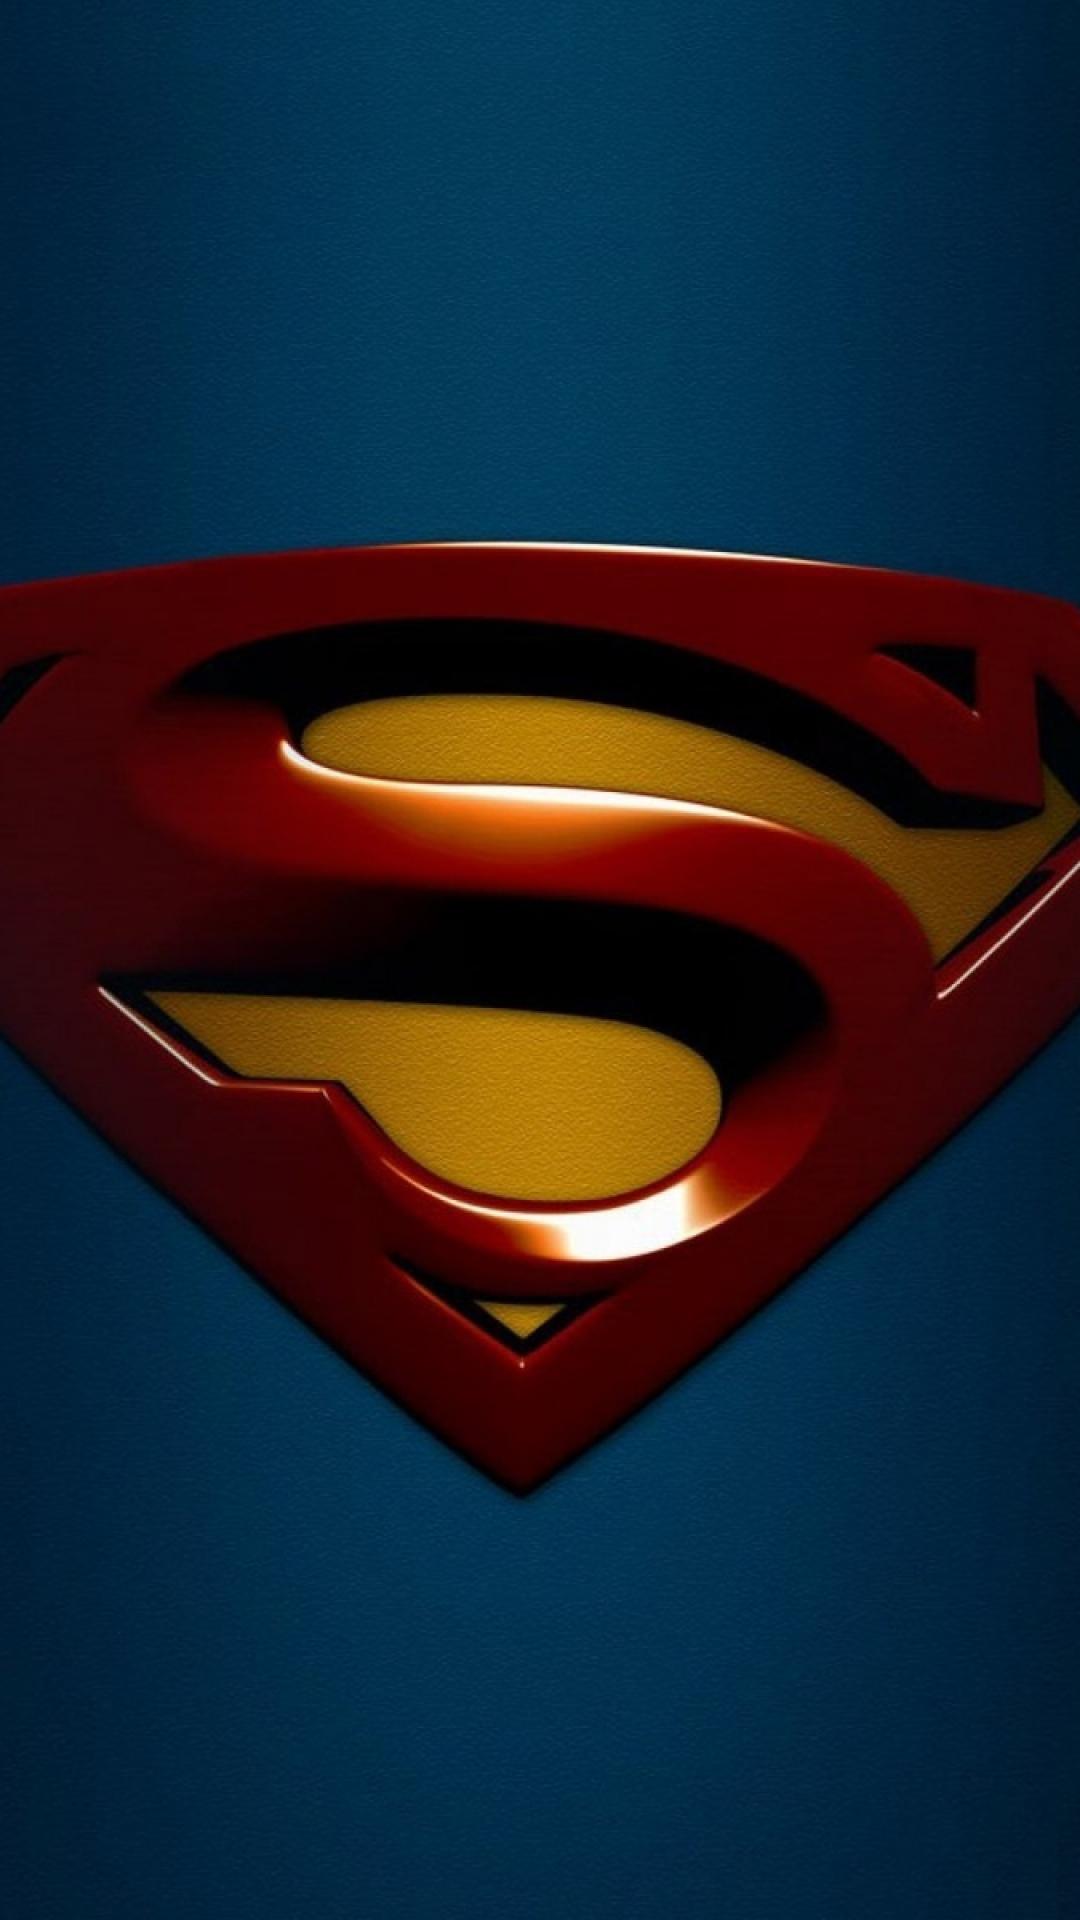 HD Background Superman Logo Blue Red S Wallpaper WallpapersByte 1080x1920